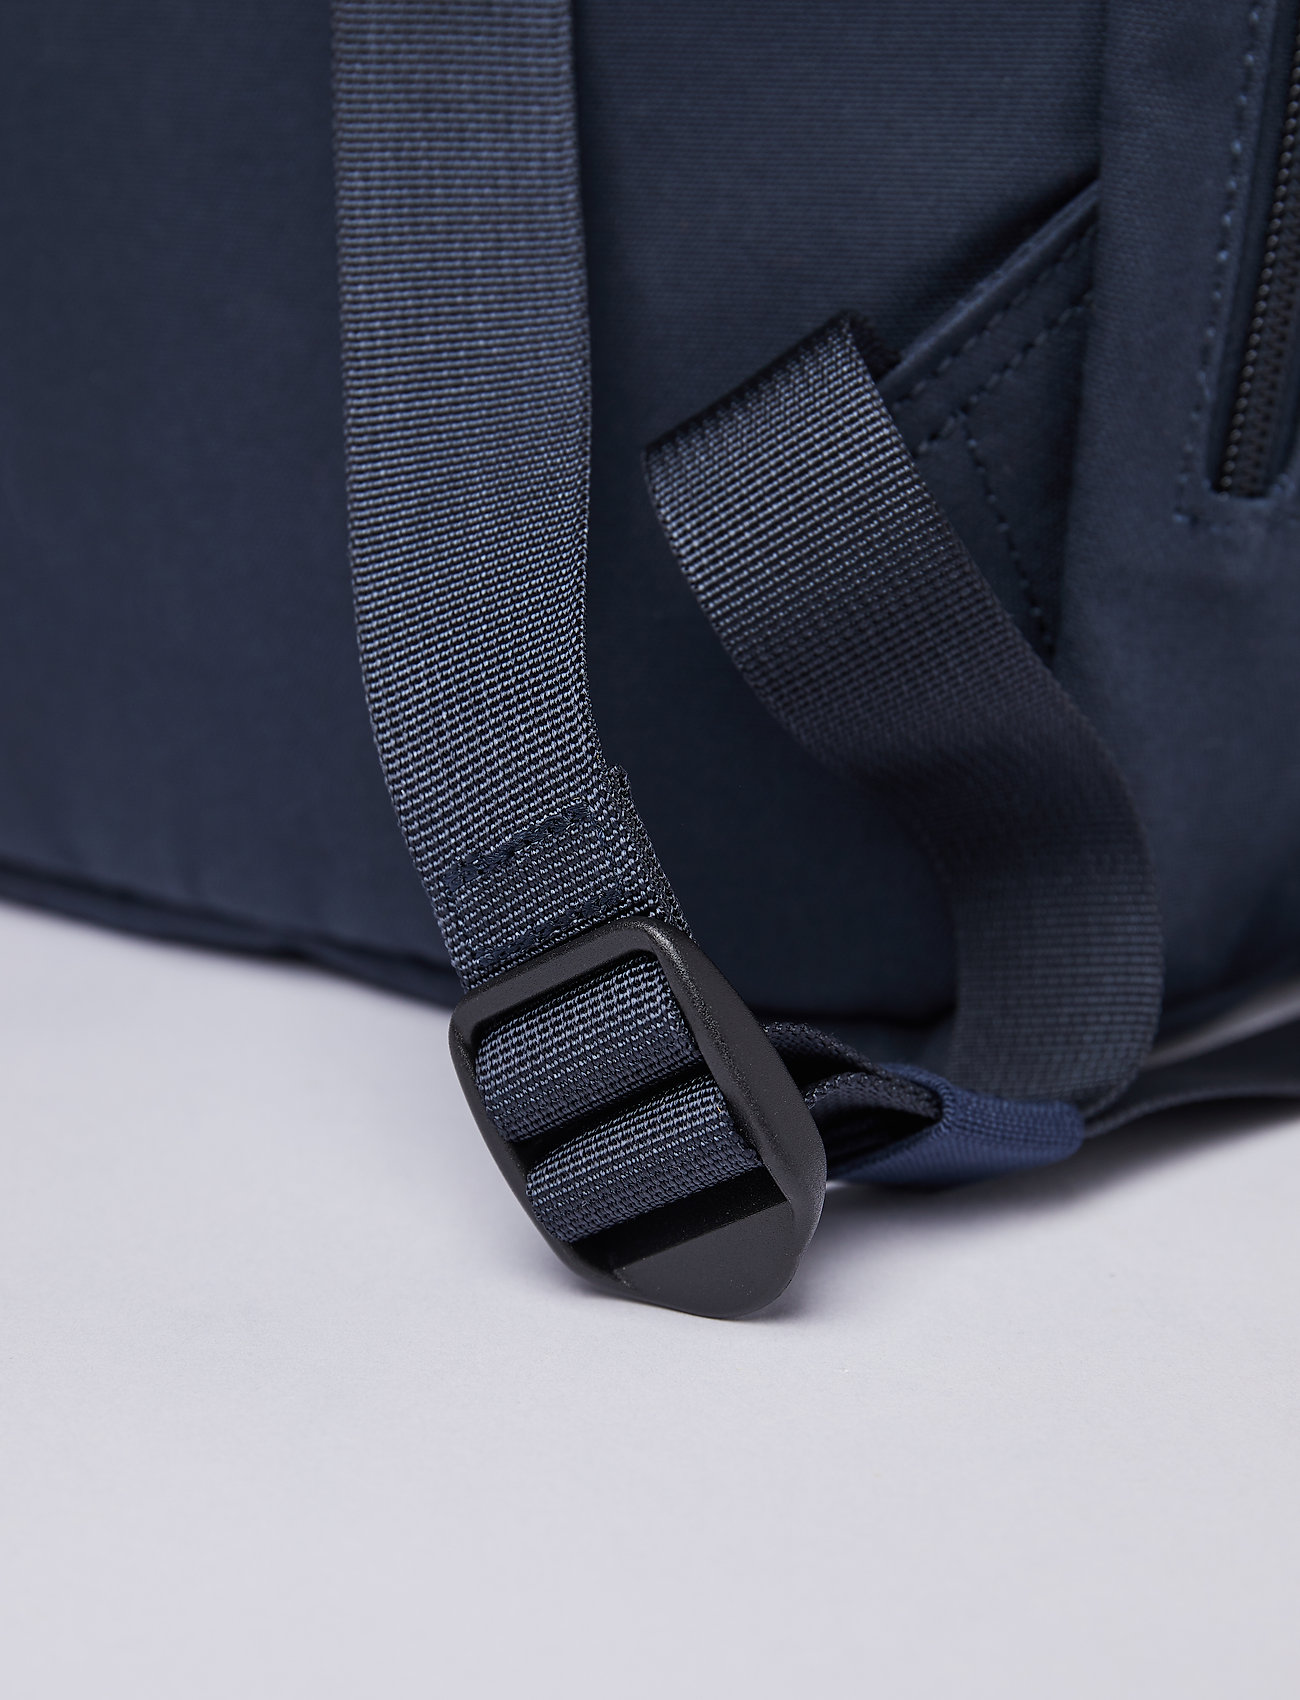 SANDQVIST - KAJ - tassen - navy blue with navy webbing - 8